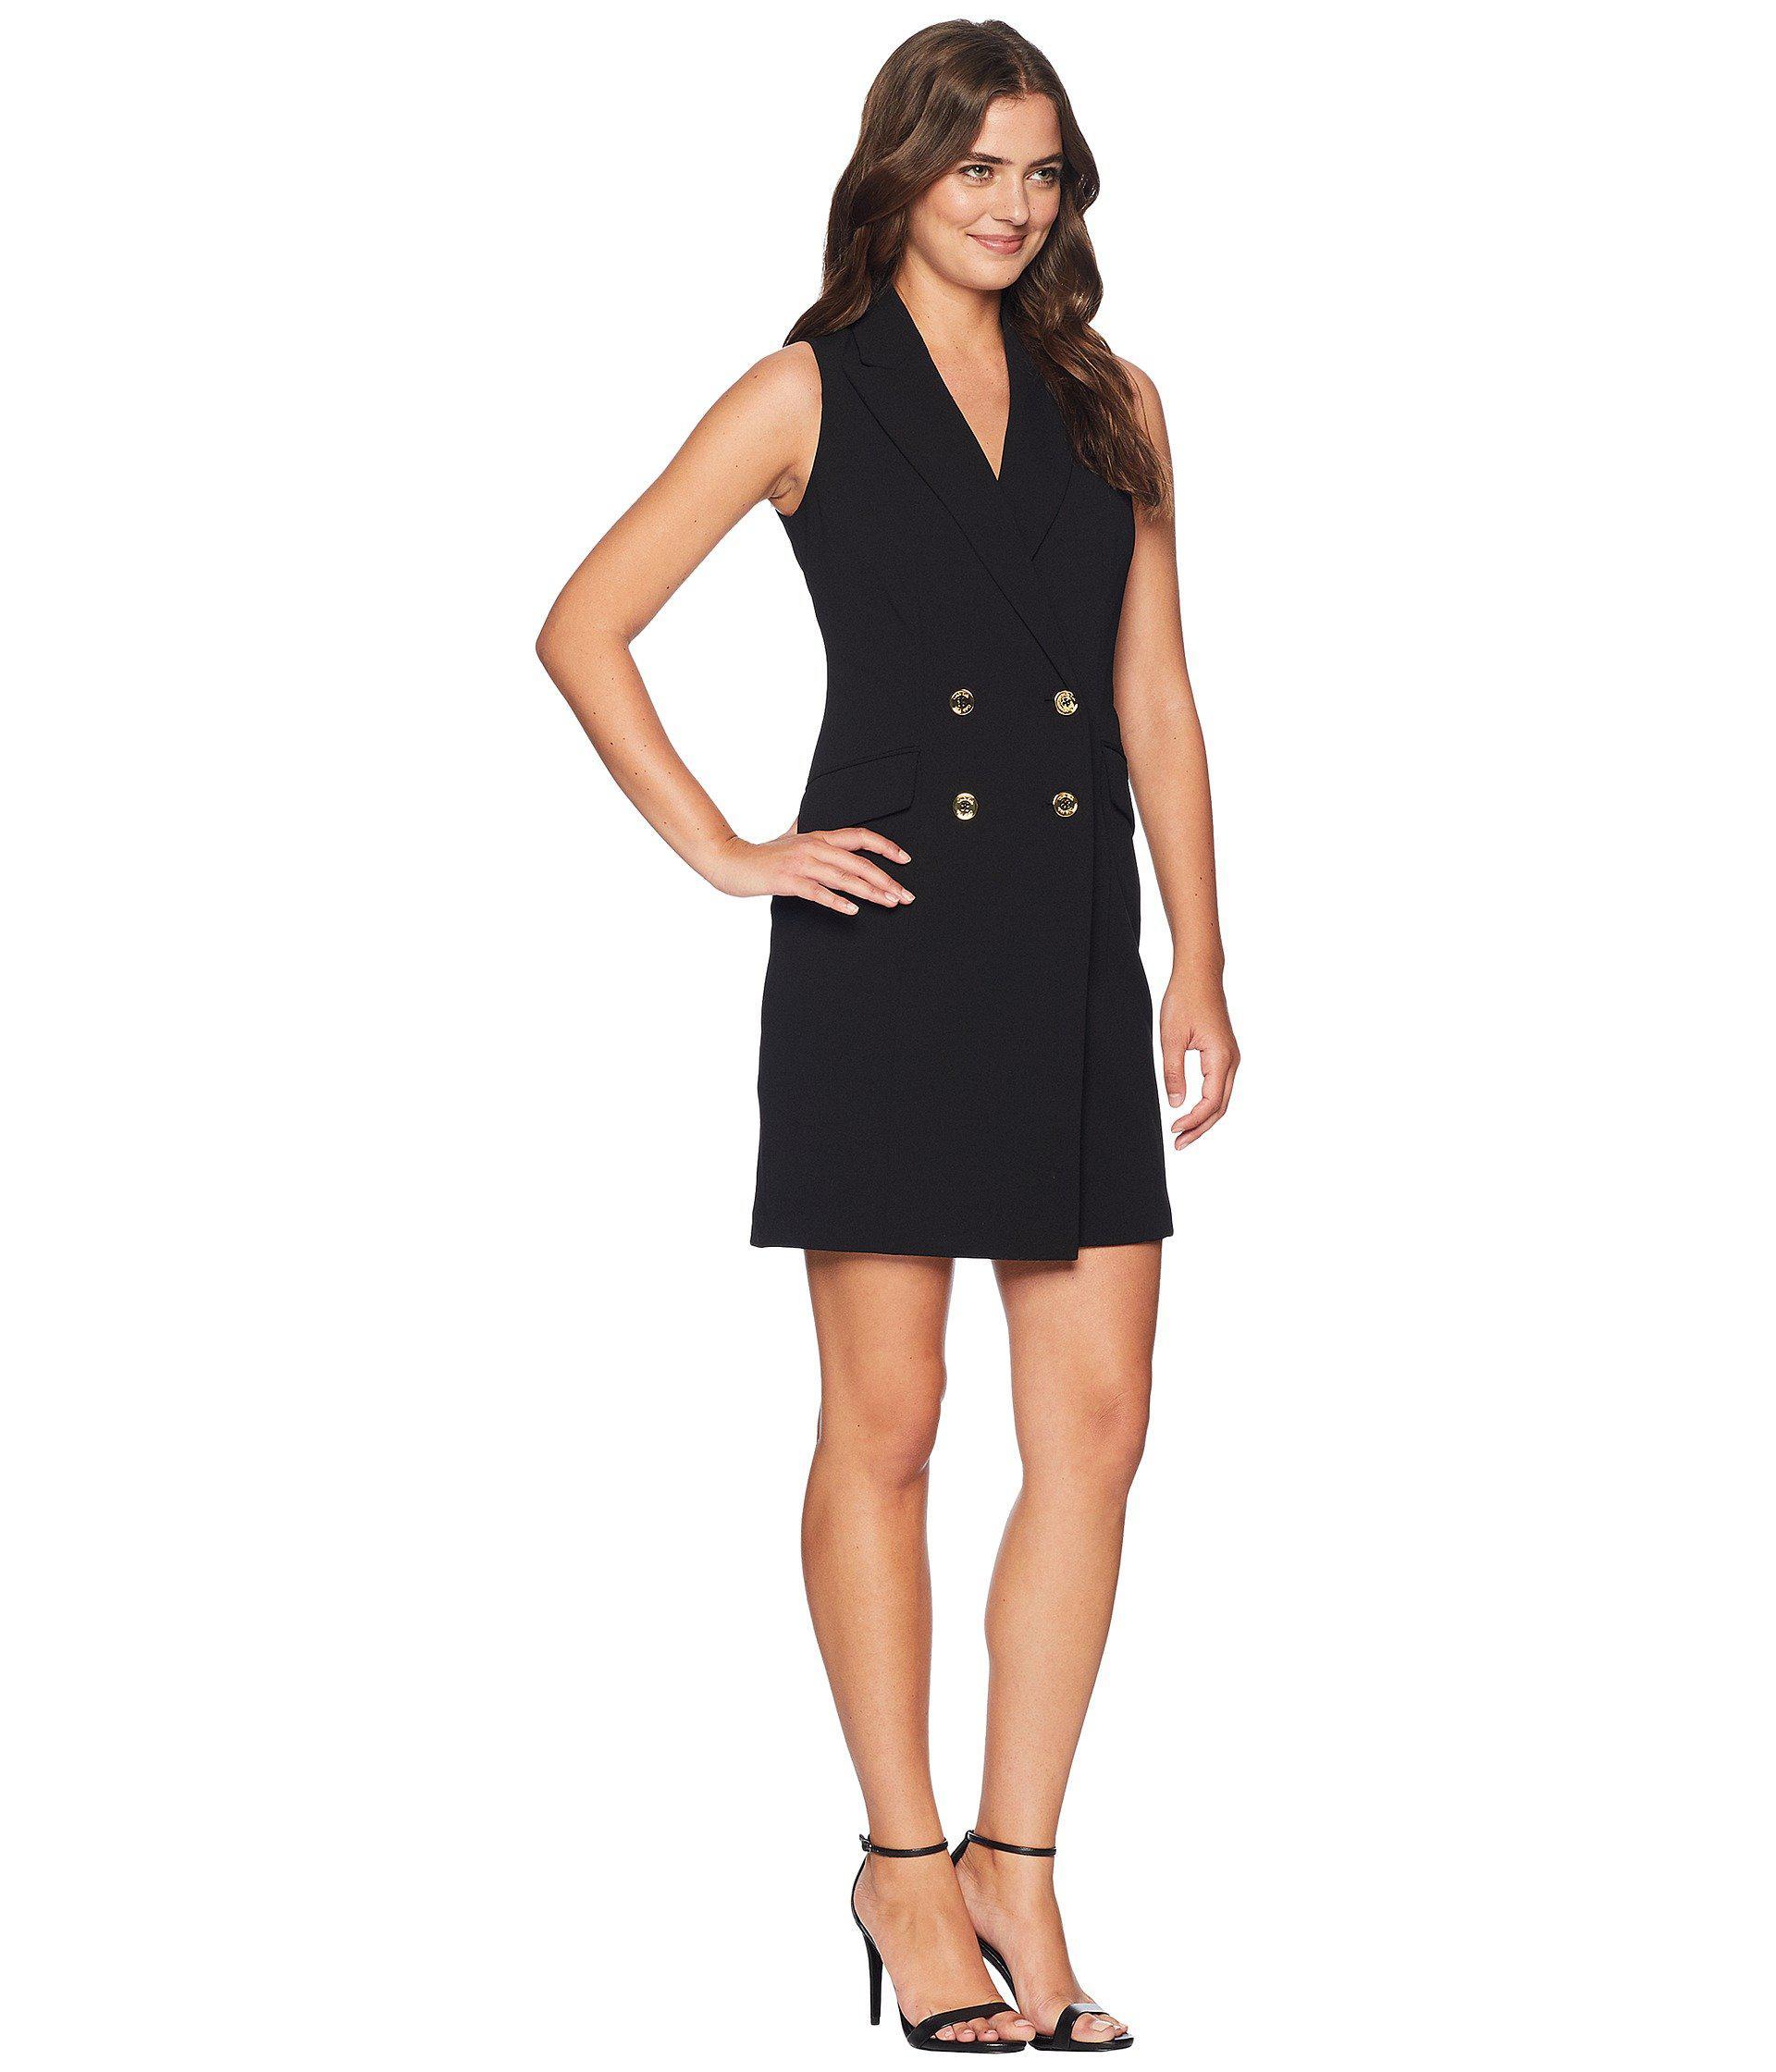 Calvin Klein Tuxedo Dress Cd8c15pl In Black Lyst